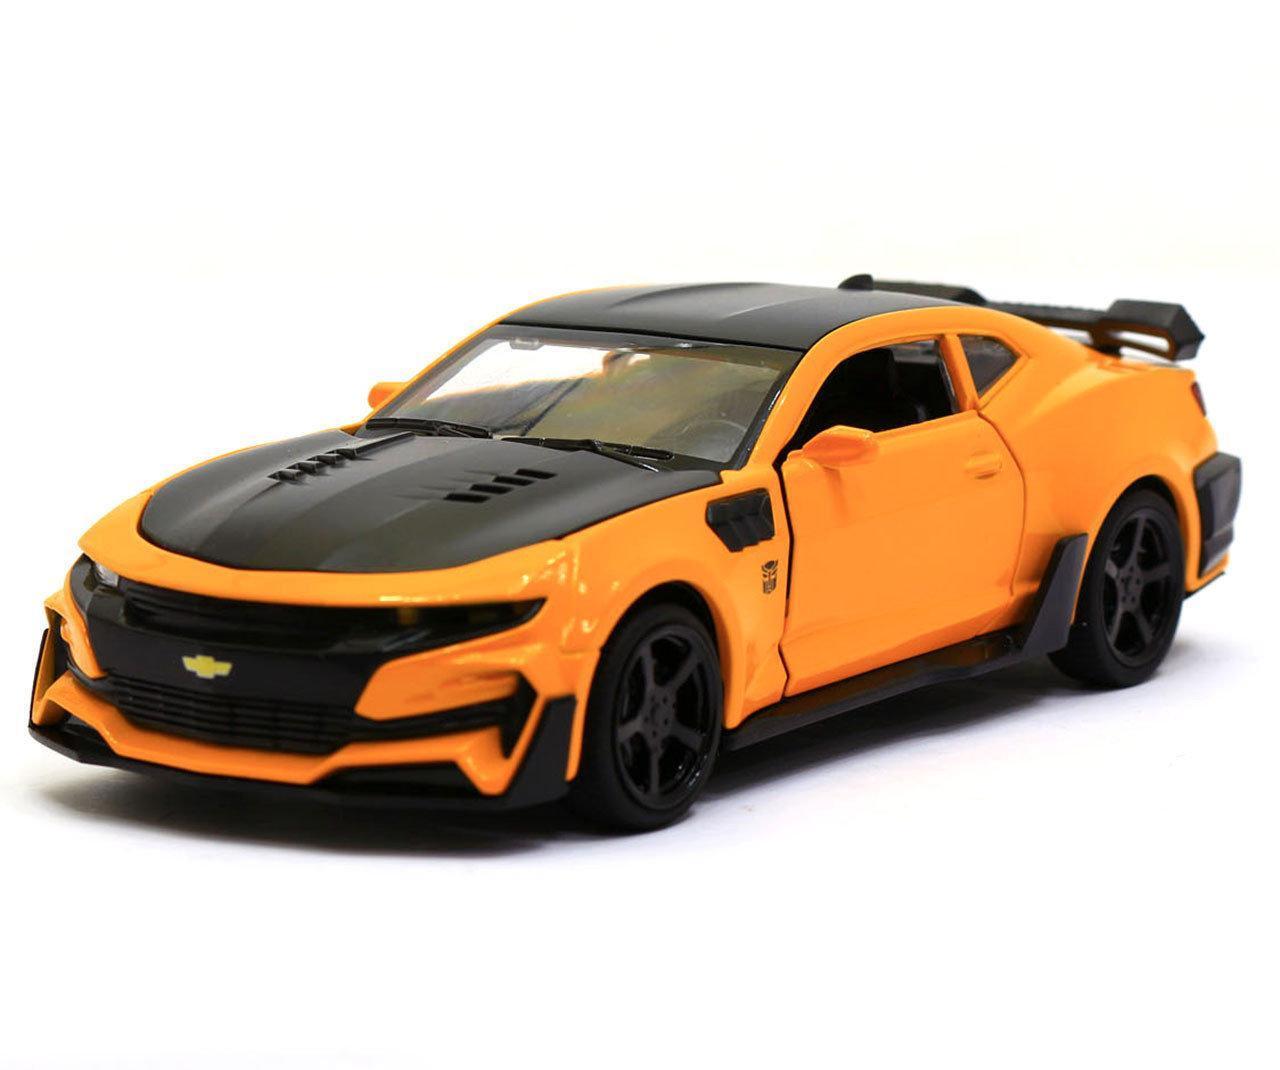 Машинка модель Автопром Chevrolet Сamaro (Шевроле Камаро) Желтый арт.7645